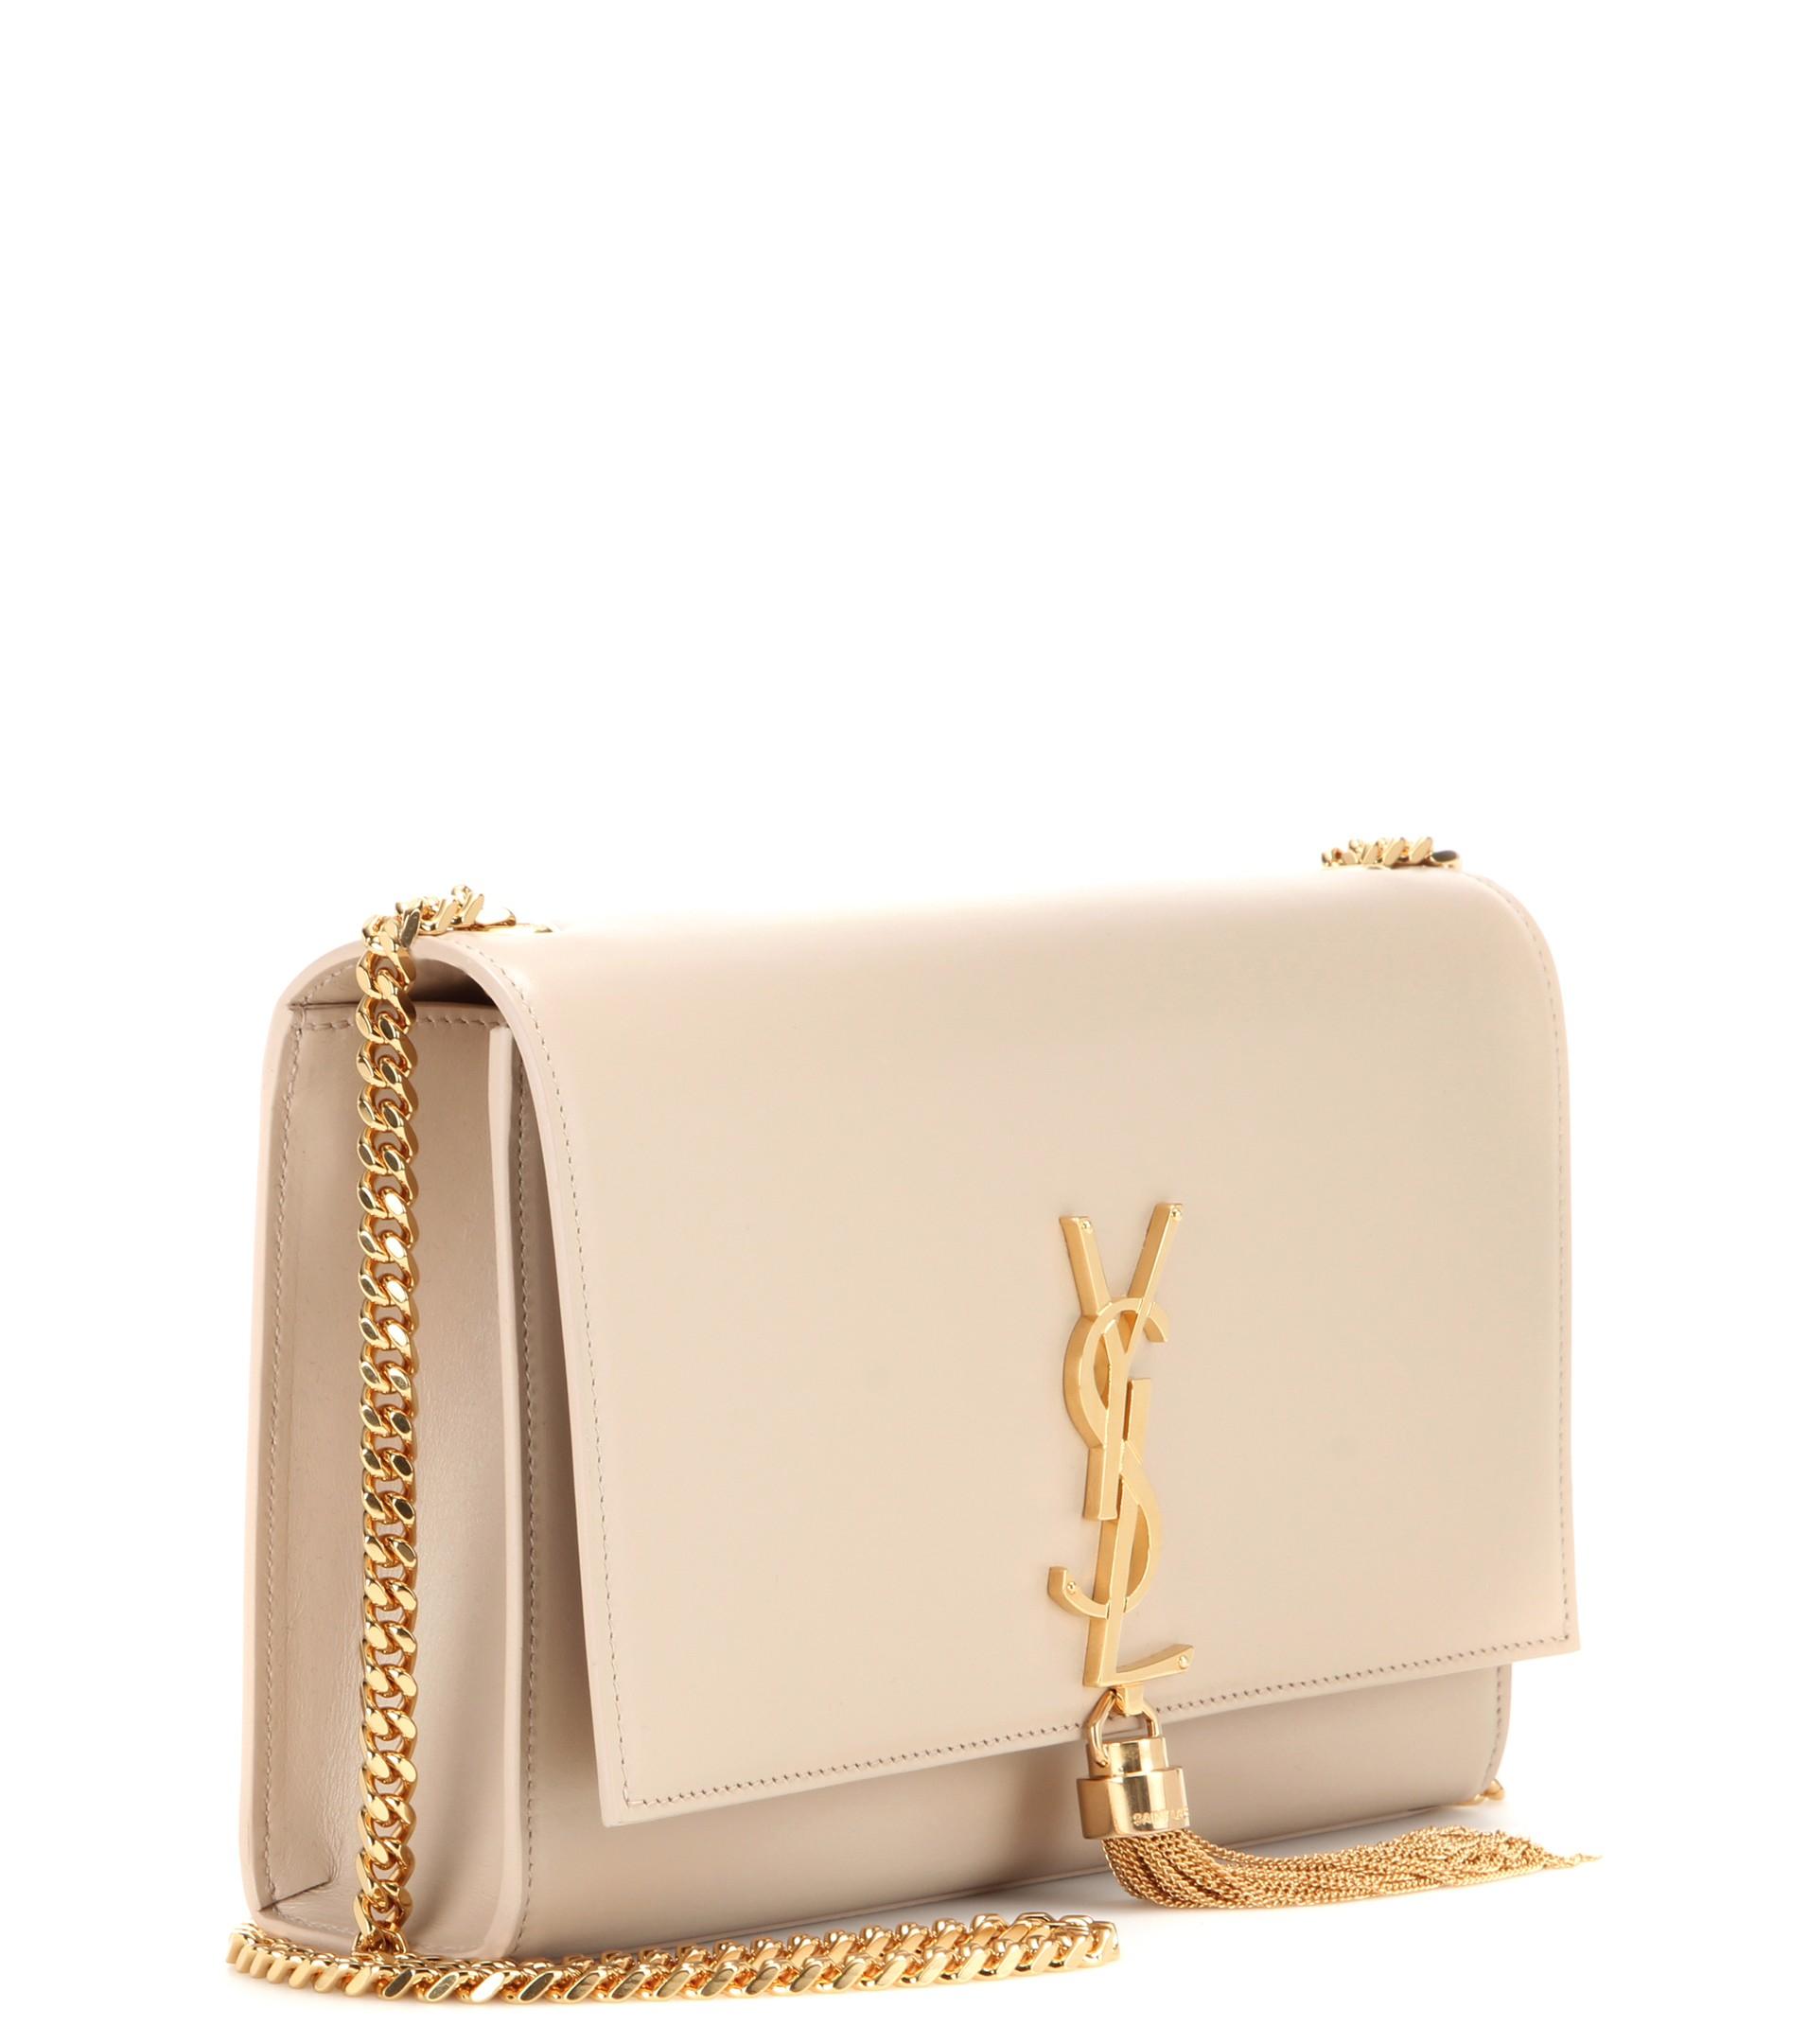 Lyst - Saint Laurent Classic Small Monogram Leather Shoulder Bag in Pink 66066d0a03572